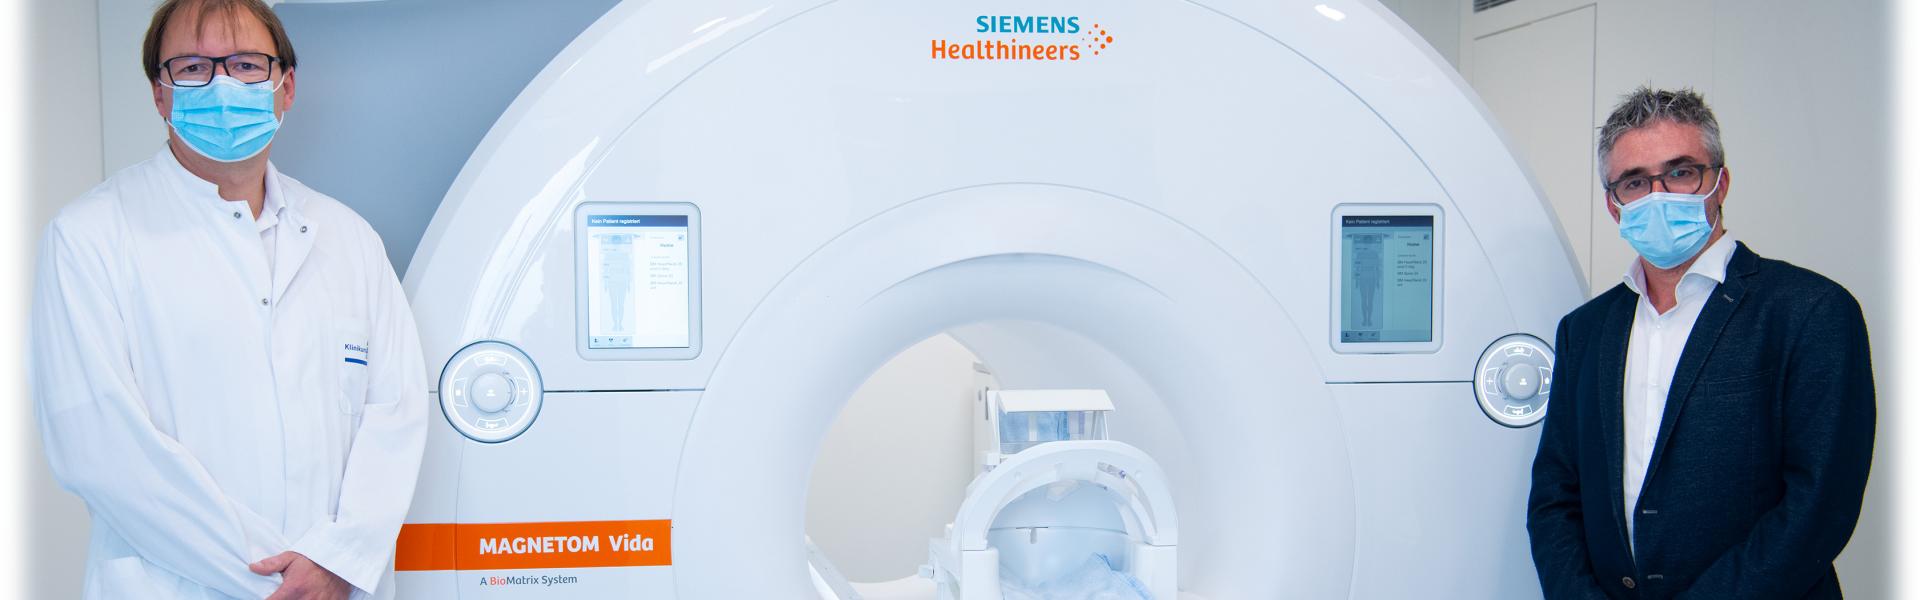 Header Bild Klinikum nimmt neues MRT-Gerät in Betrieb